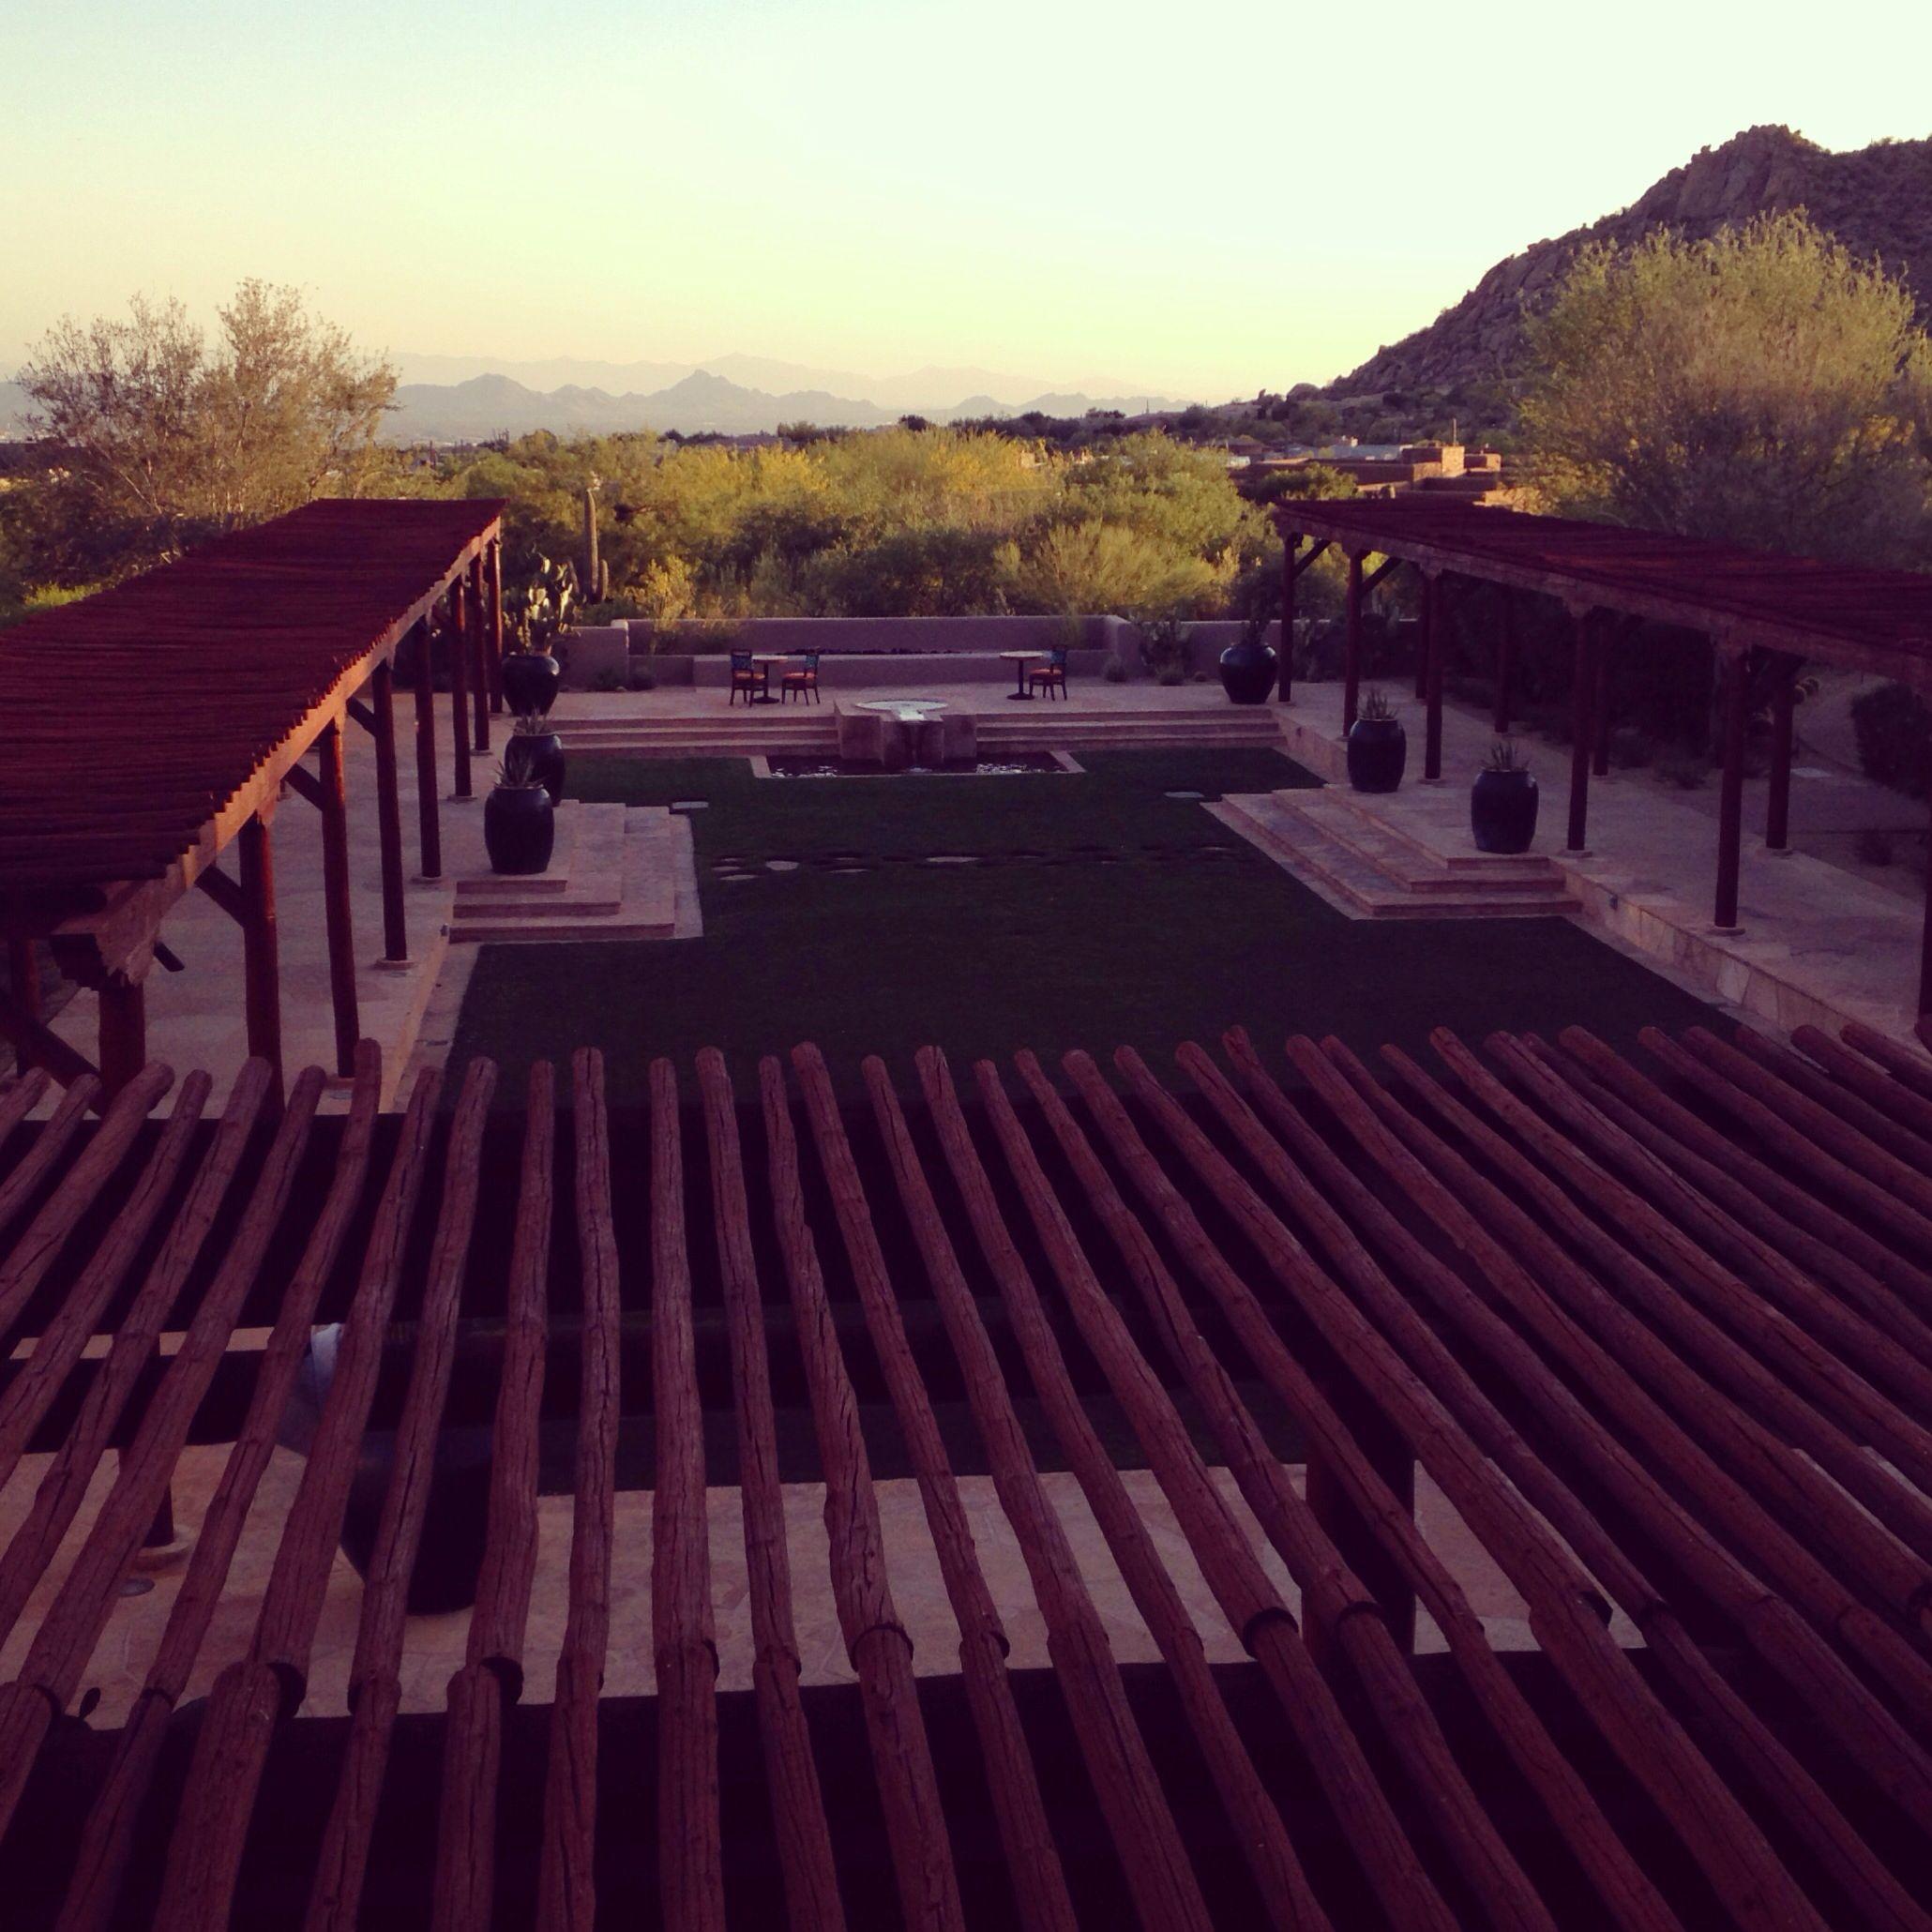 Four Seasons Scottsdale | Outdoor, Four seasons, Farmland on Seasons Outdoor Living id=89125